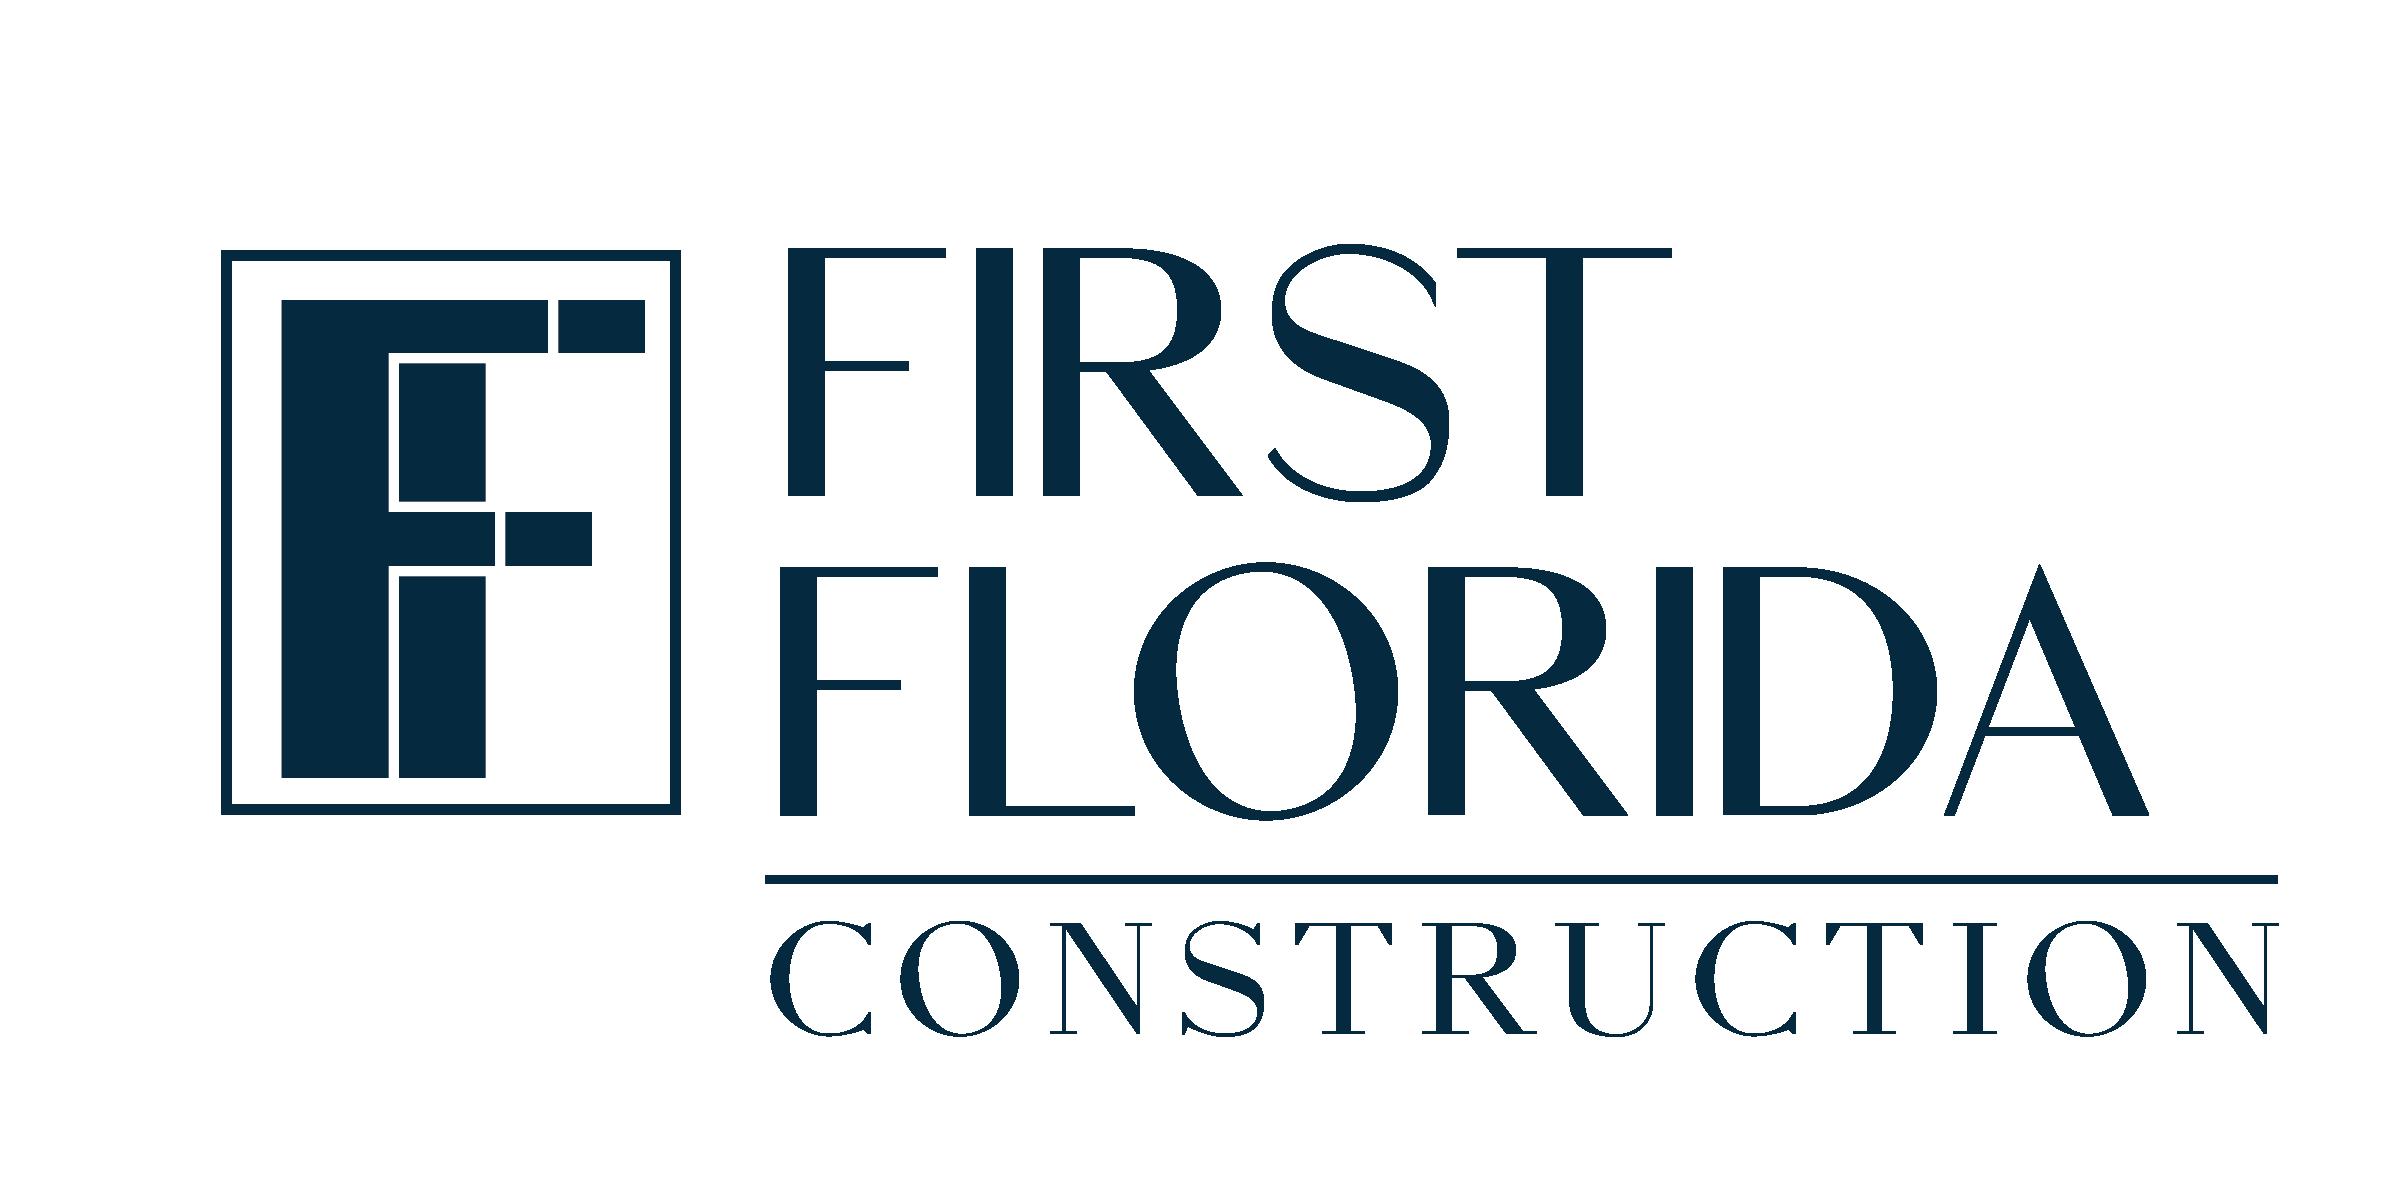 FIRST FLORIDA